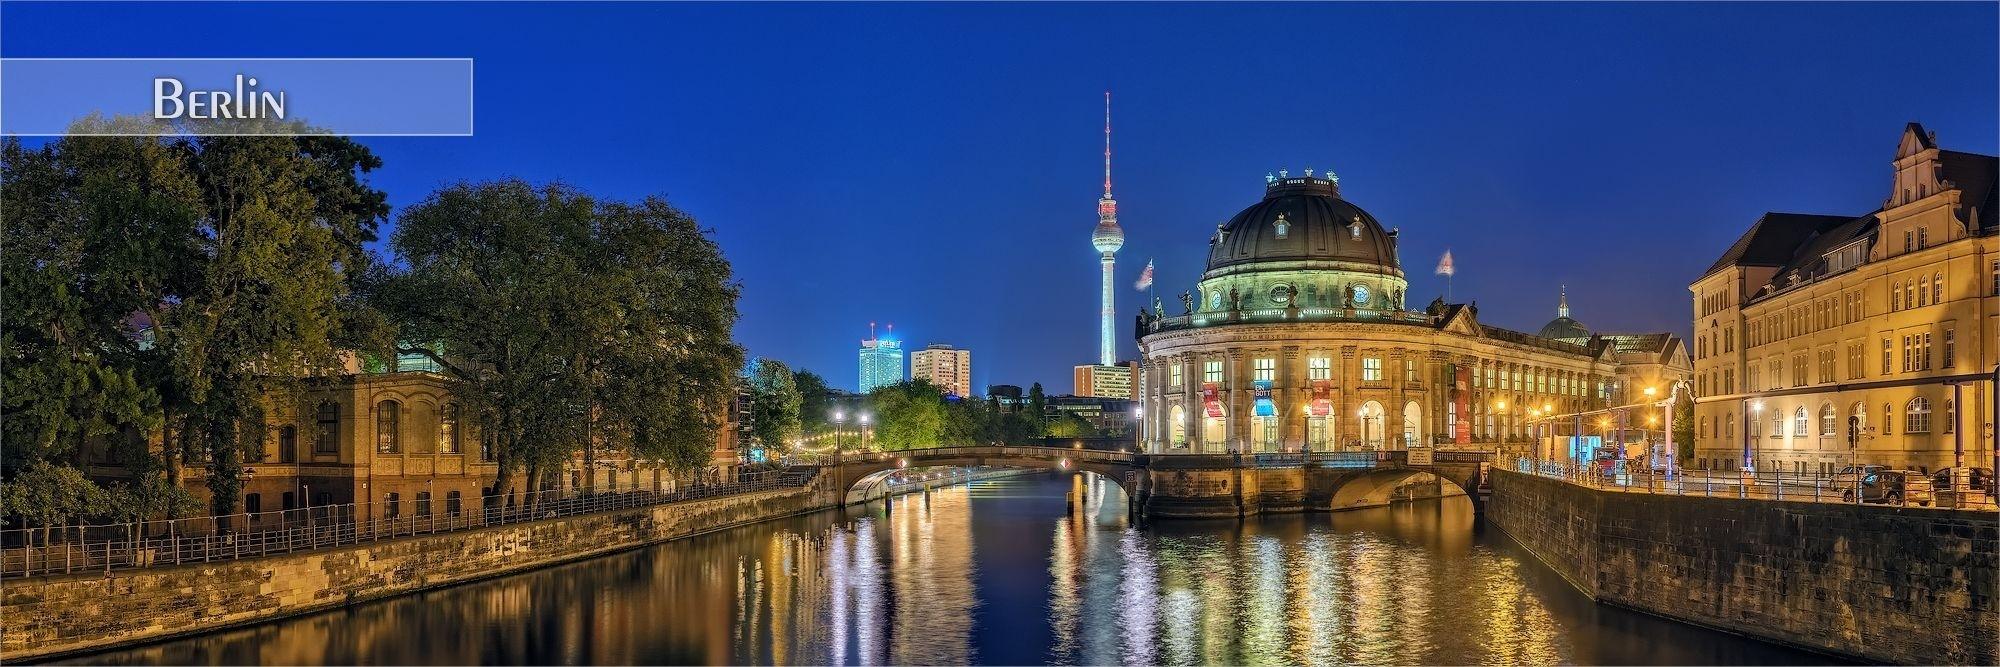 FineArt & Panoramafotografien aus Berlin